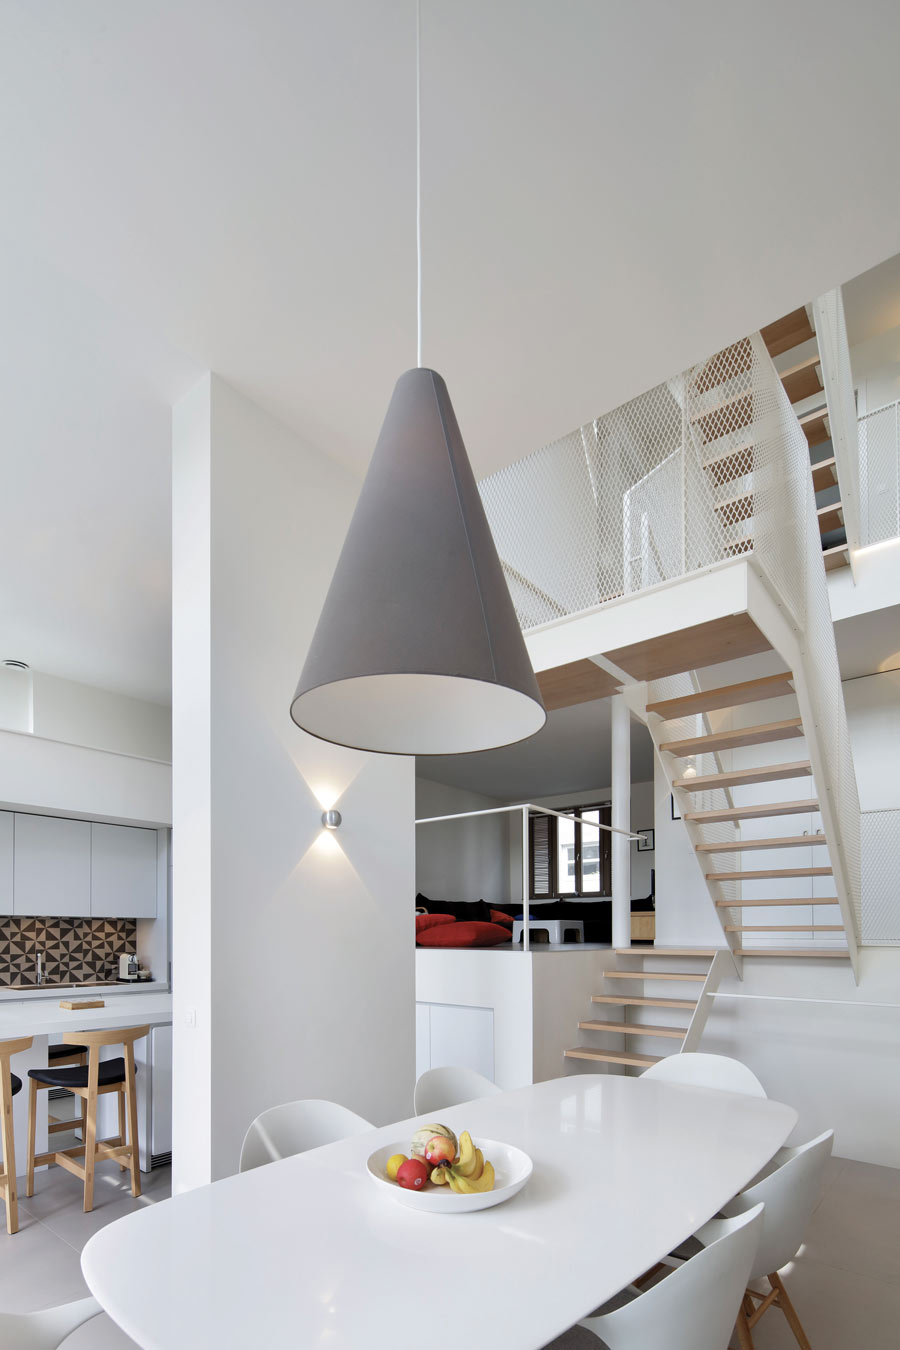 Focus-archi-magazine-architecture-bruxelles-renovation-salle-manger.jpg